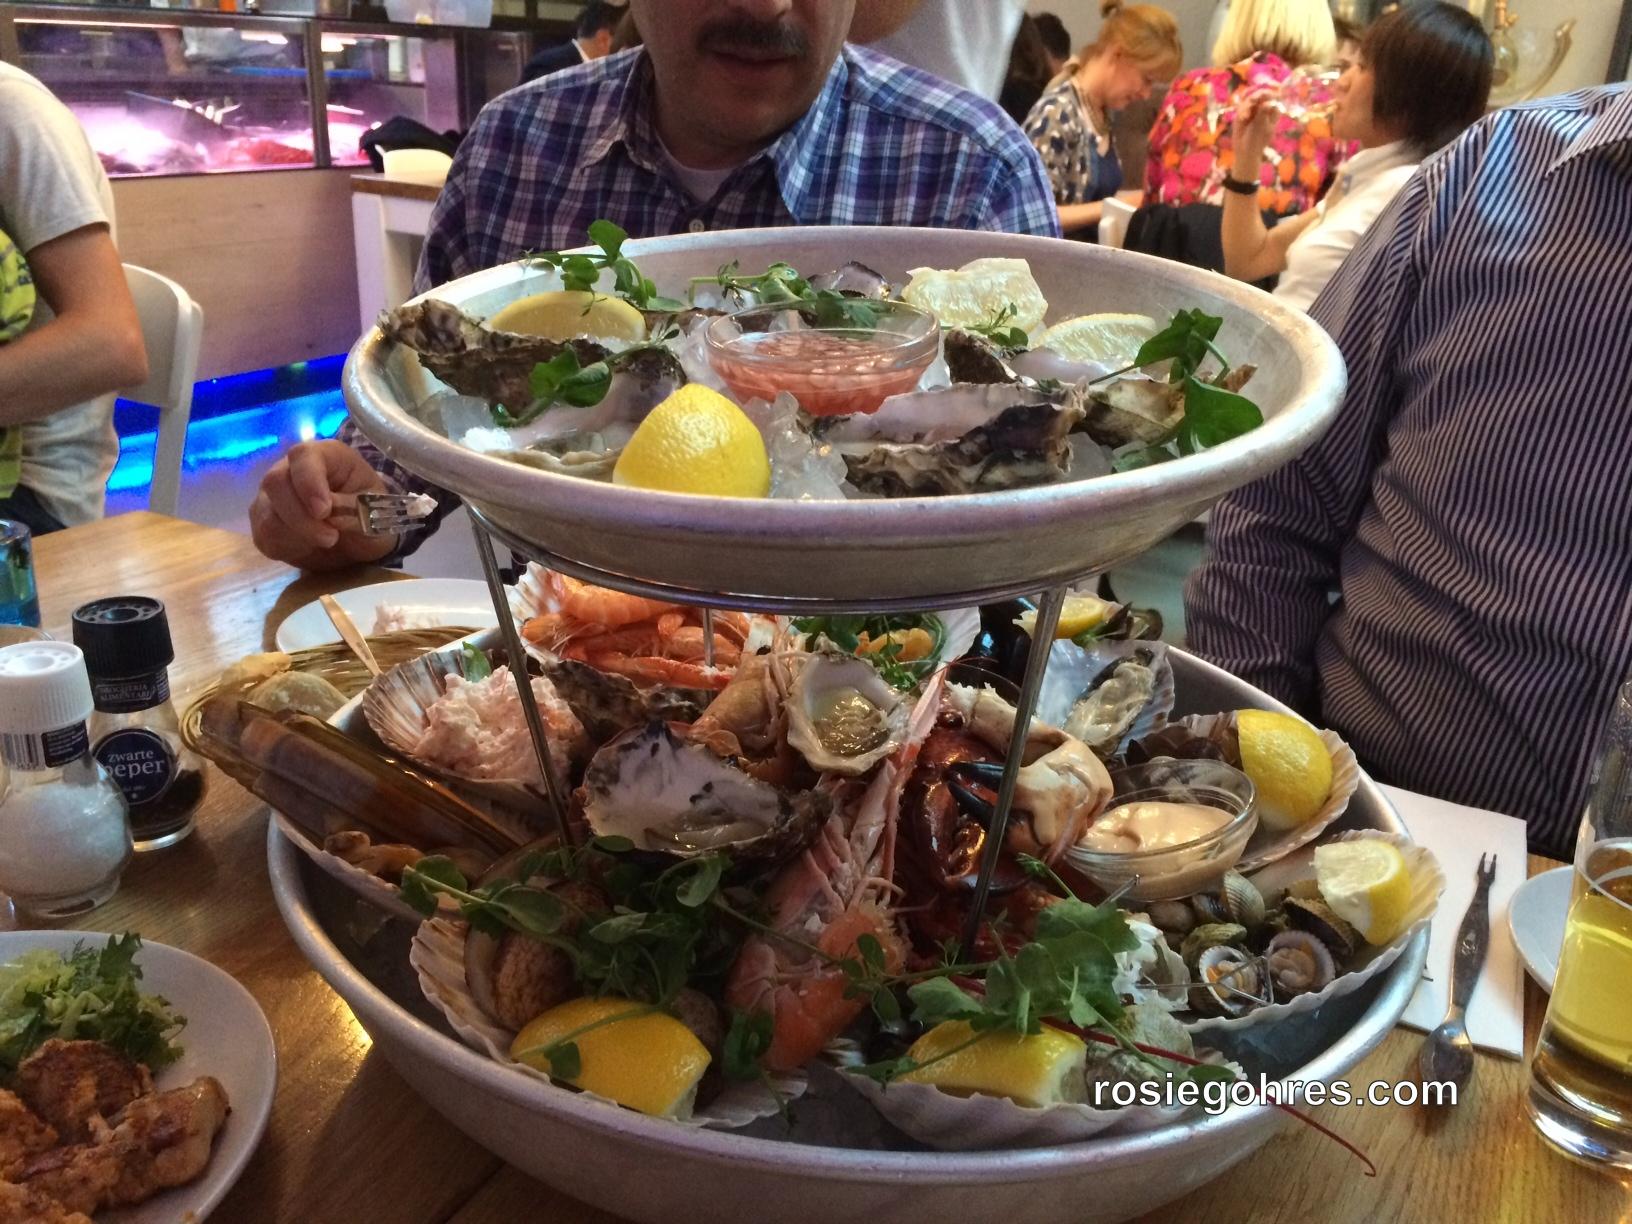 The Seafood Bar : Best Seafood Restaurant in Amsterdam - Rosie Gohres: www.rosiegohres.com/seafood-bar.htm